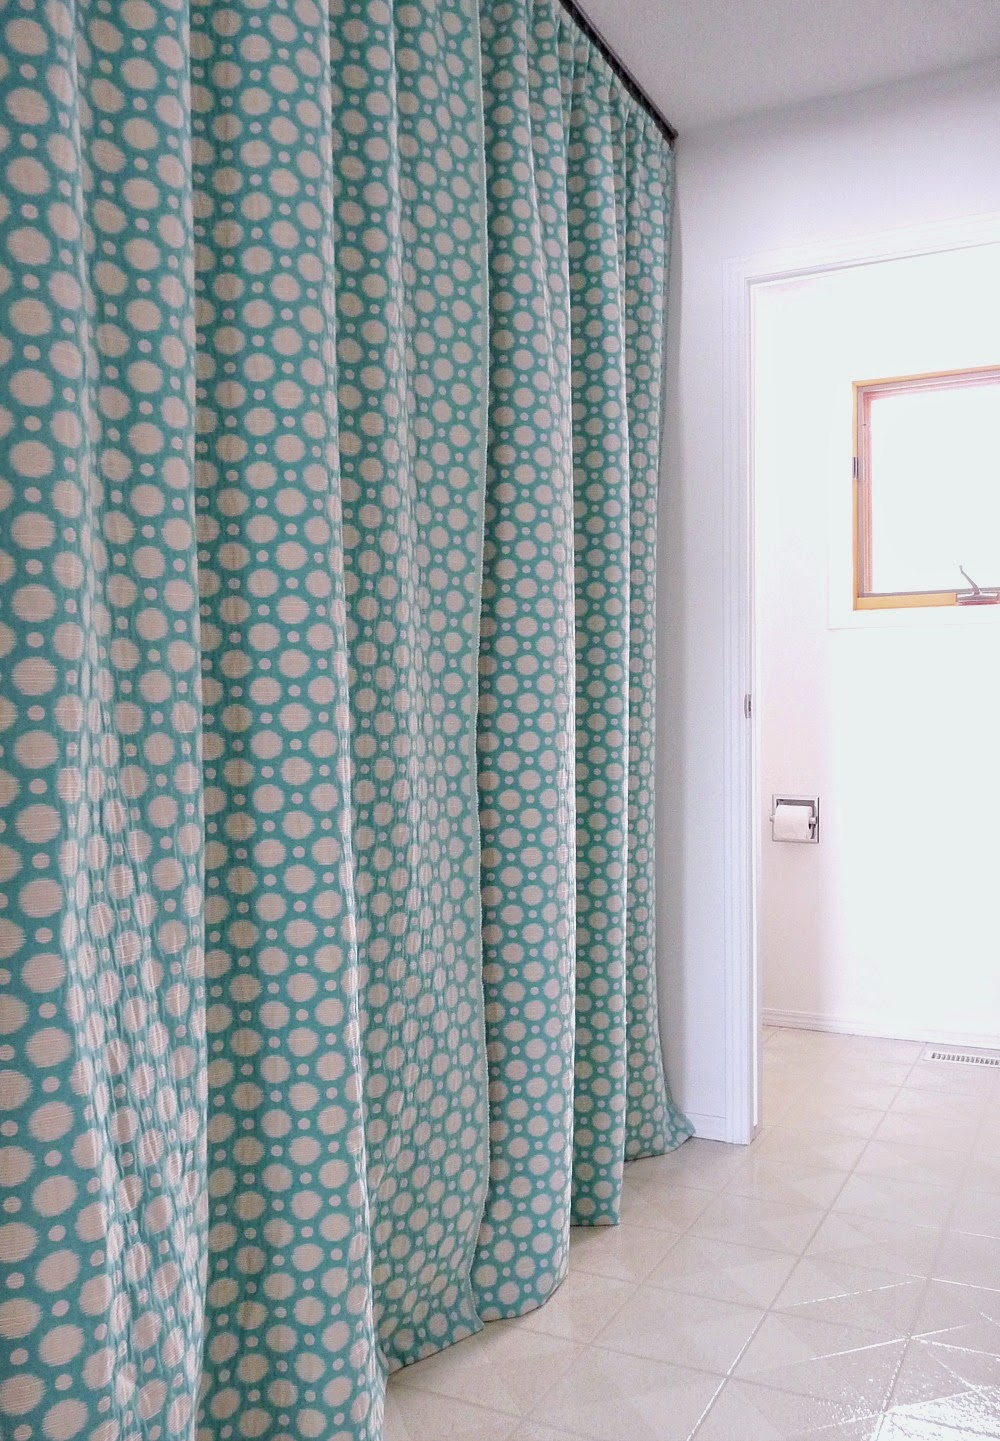 Aqua Polka Dot Curtains